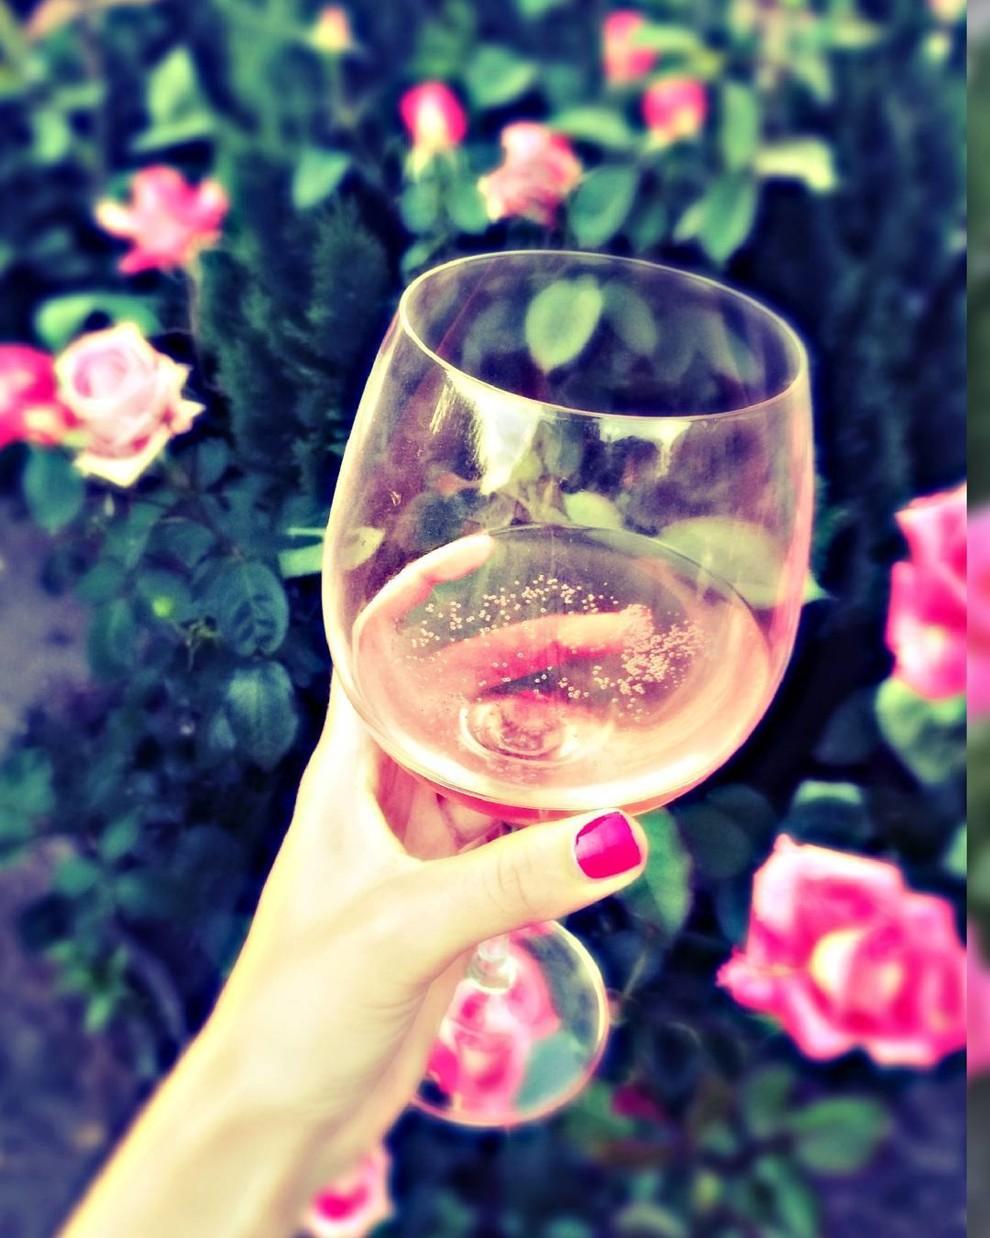 музыка розовое вино текст